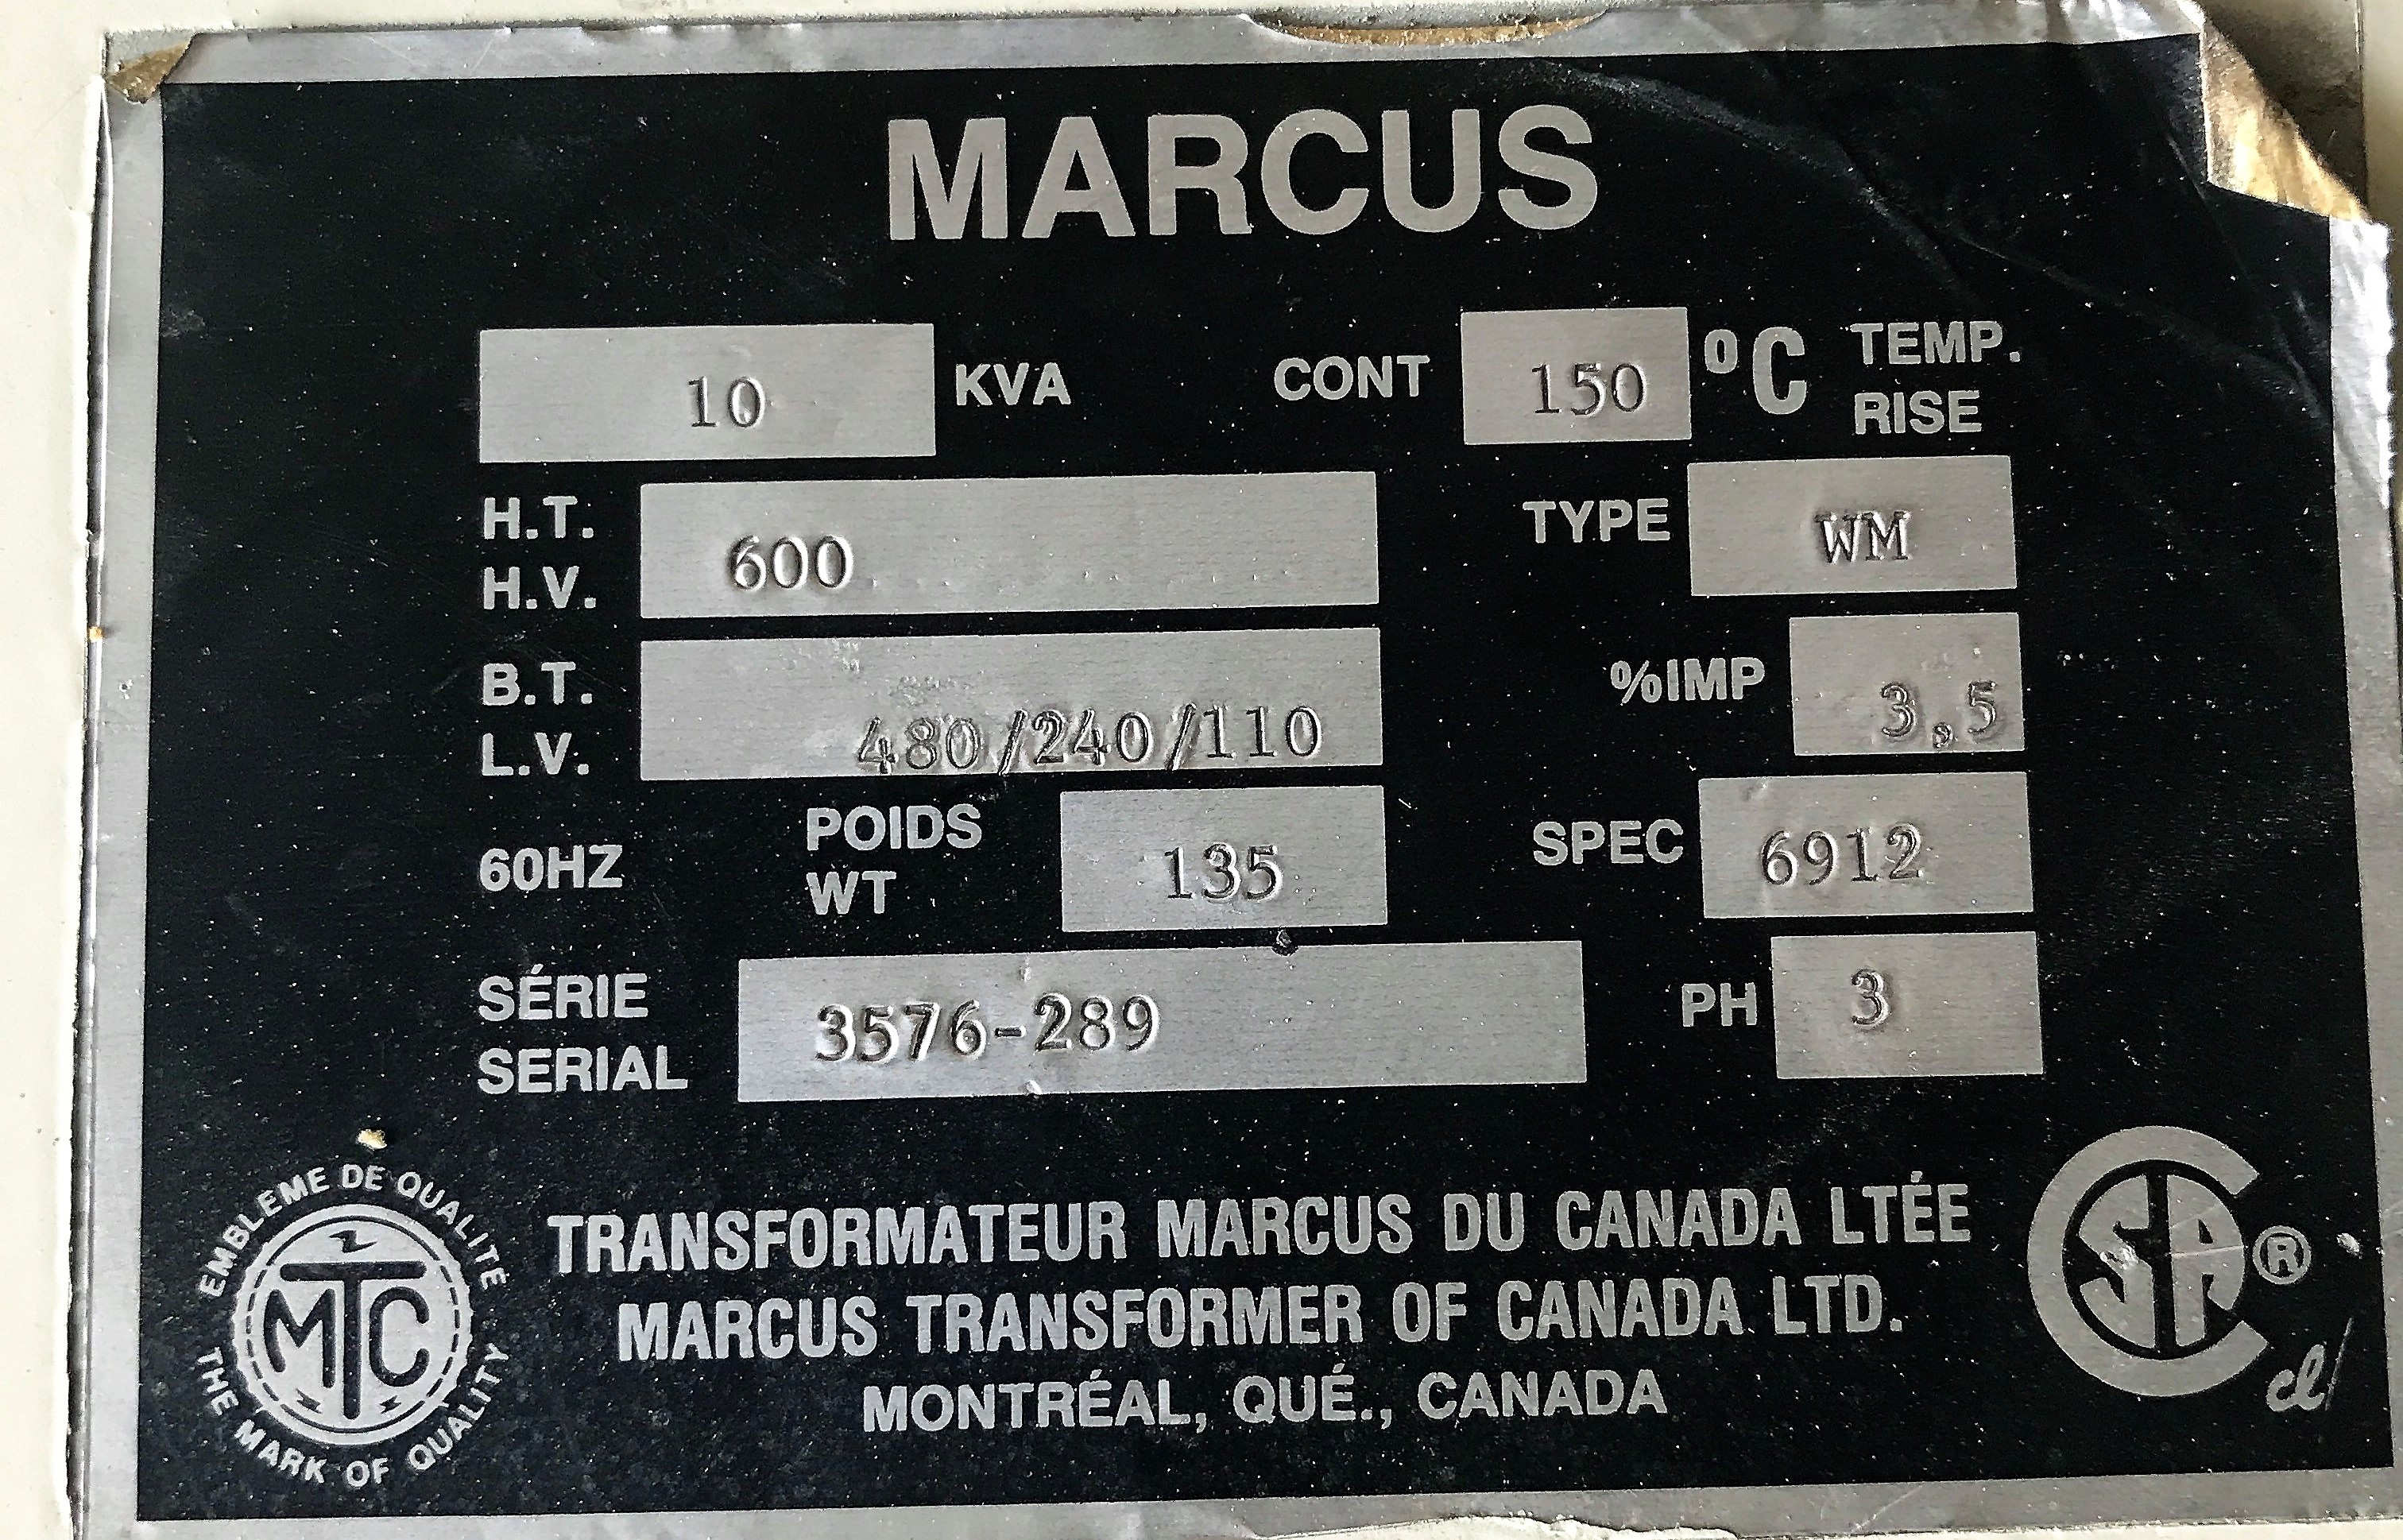 Lot 49A - MARCUS 10KVA 600V PRIMARY 480/240/110V SECONDARY ISOLATION TRANSFORMER